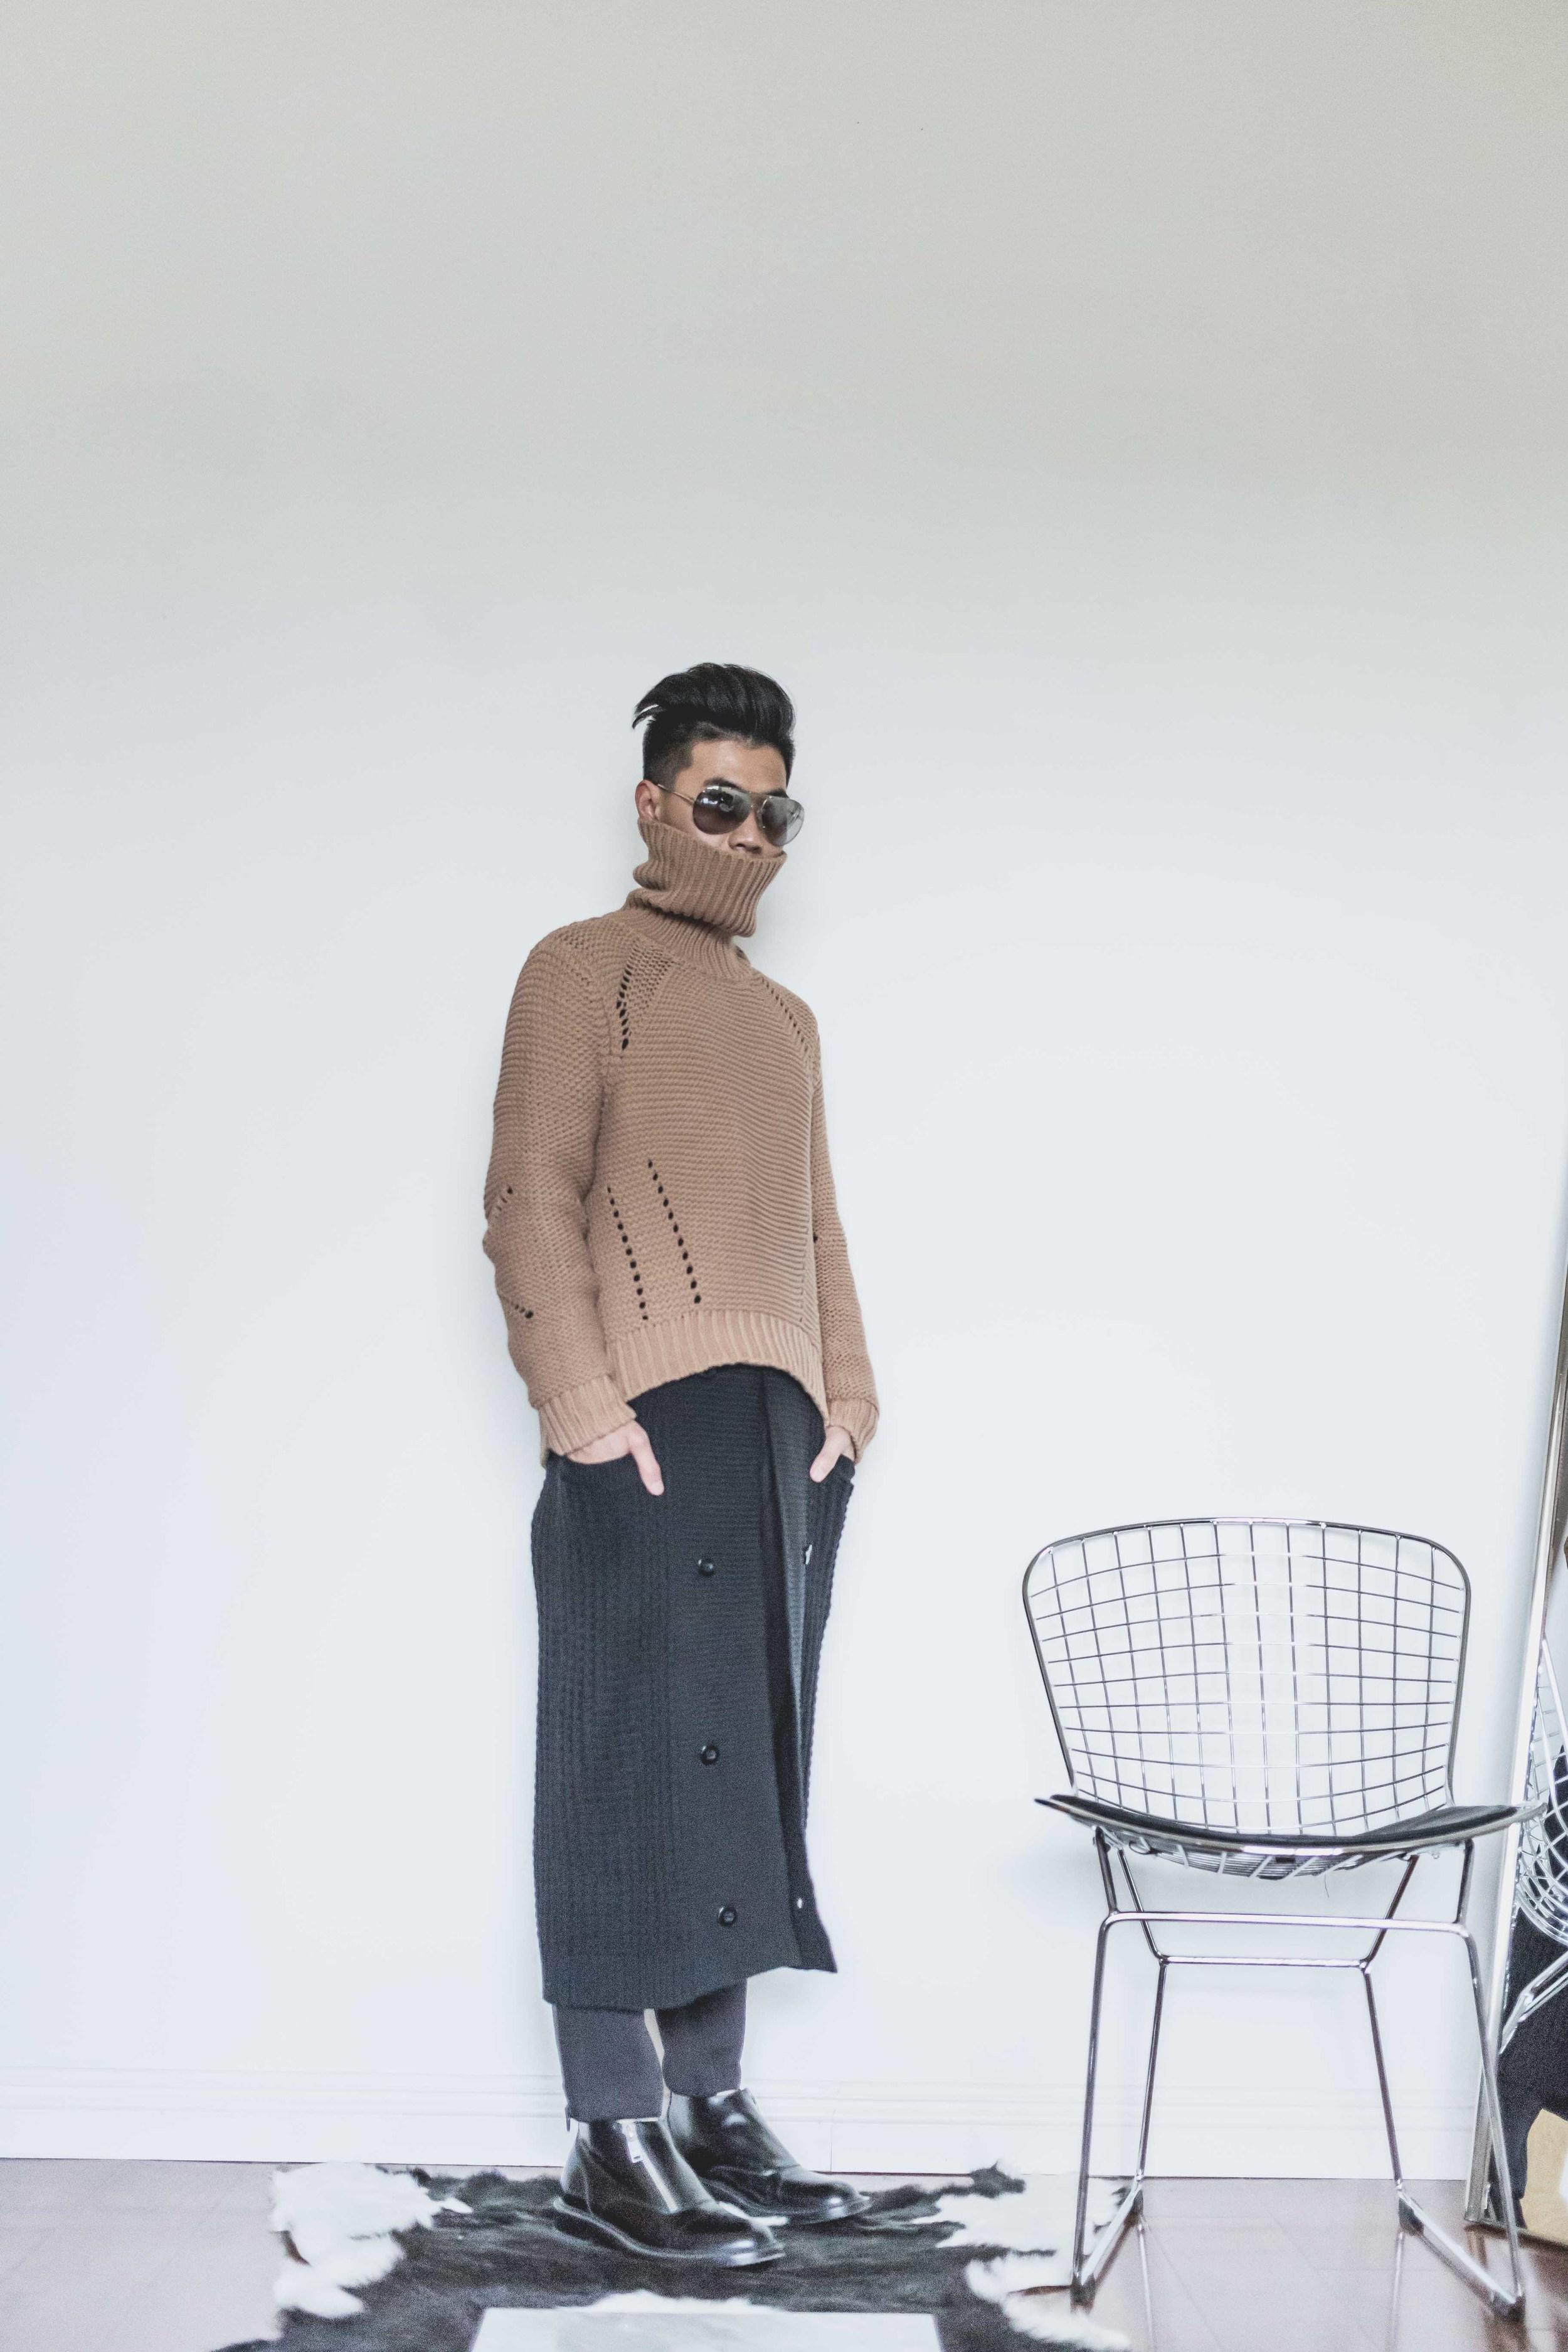 Joe Jeans    turtleneck sweater   /  Join Chapter    long cardigan   /  Dolce & Gabbana    reflective sunglasses   /  Saint Laurent    ankle boots